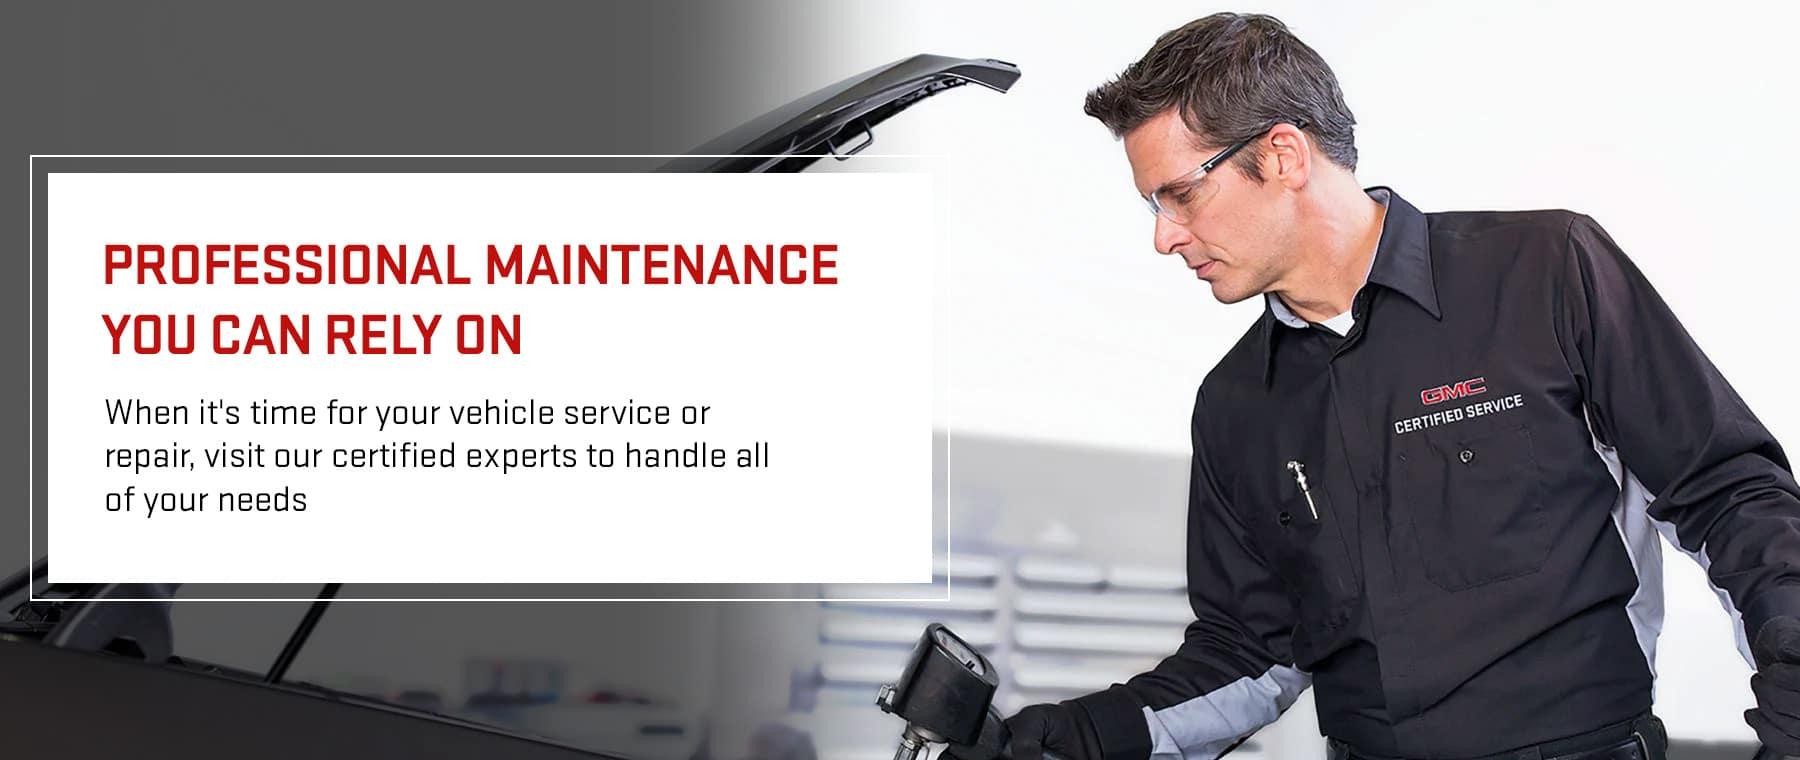 TLBG_SL_1800x760_maintenance